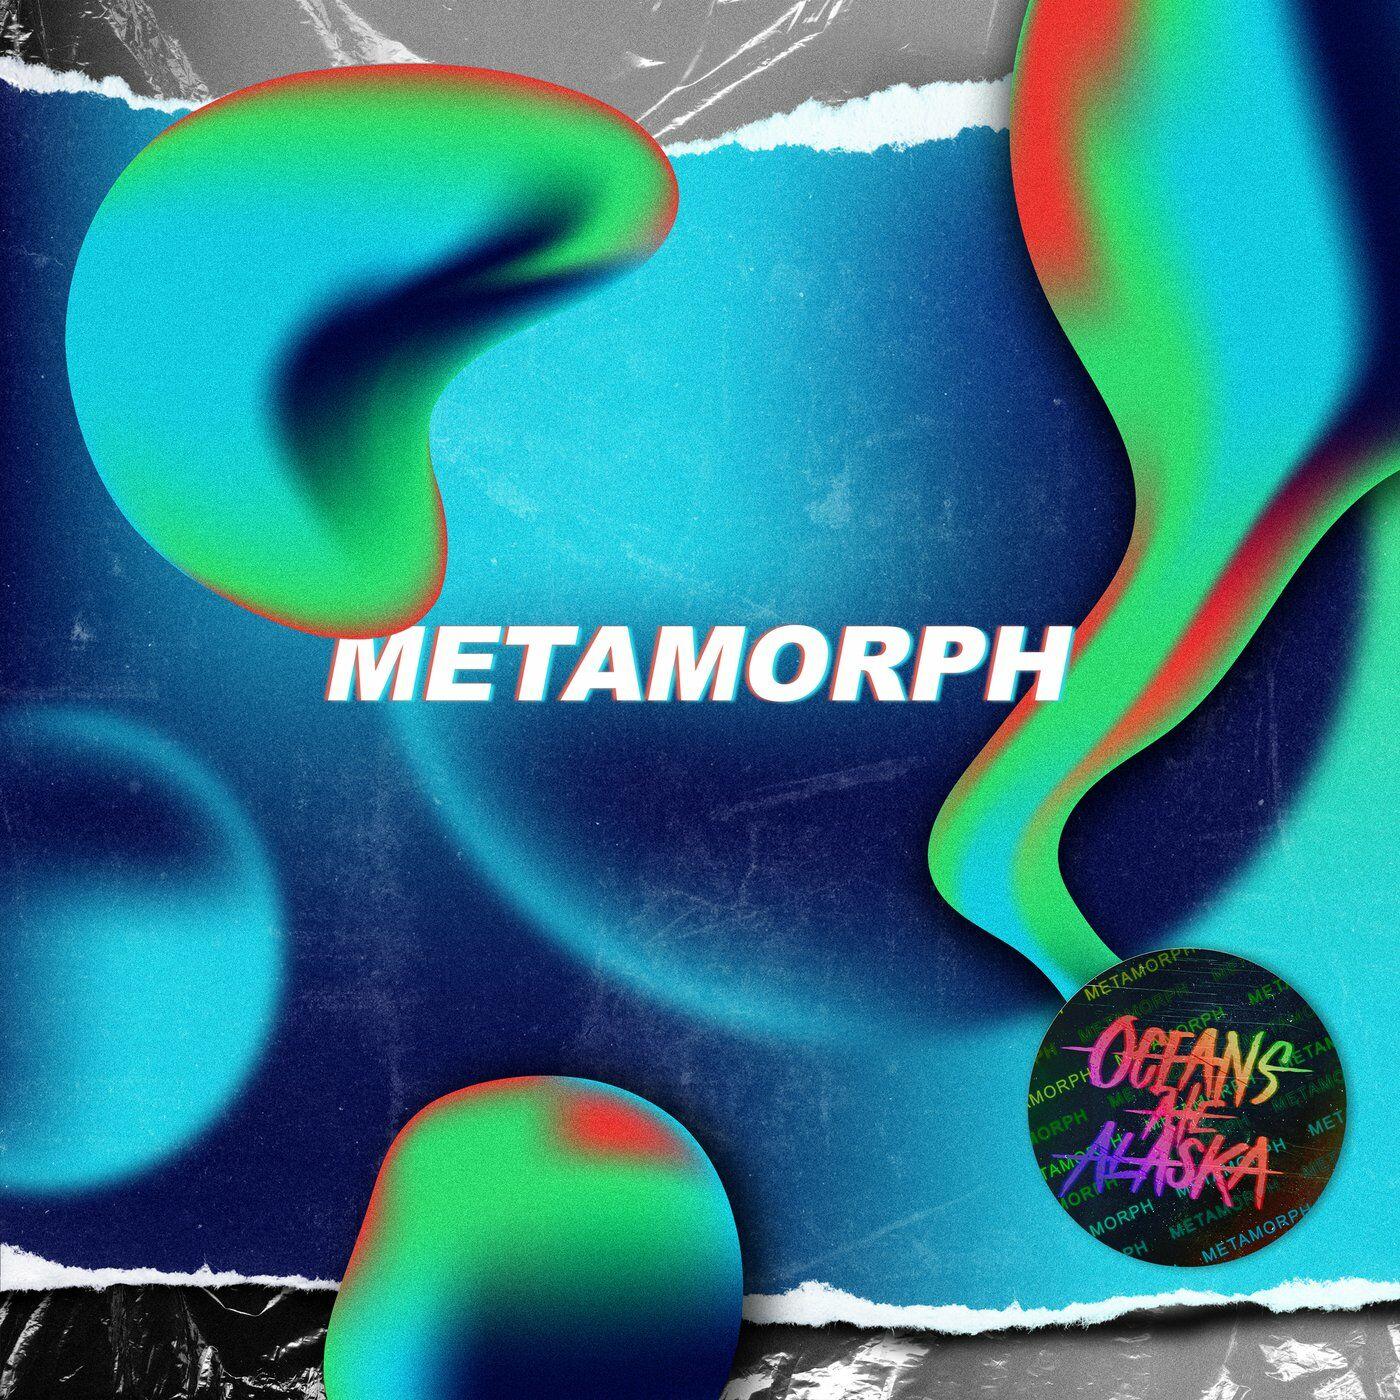 Oceans Ate Alaska - Metamorph [single] (2020)